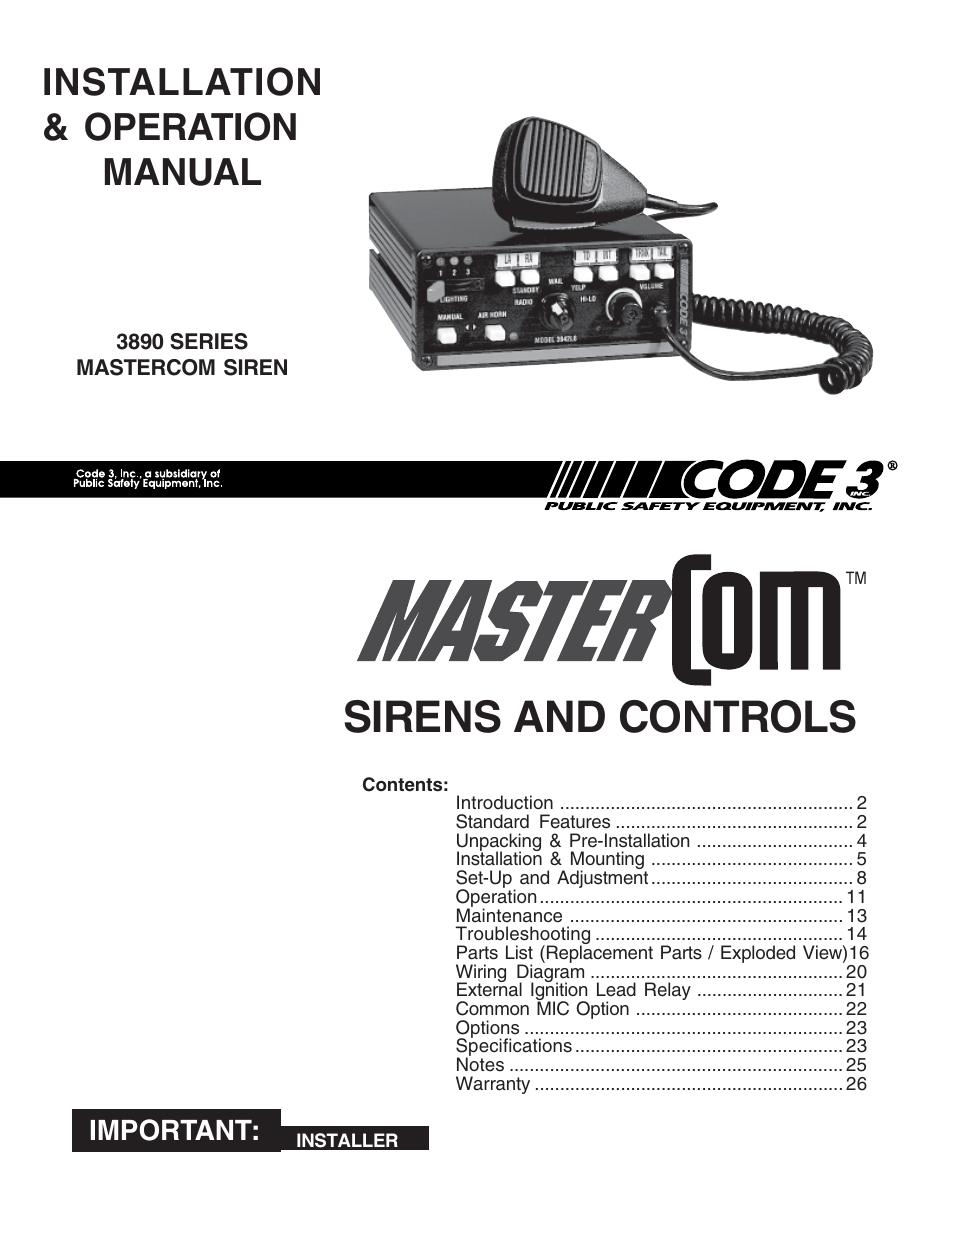 Code 3 Mastercom Wiring Diagram